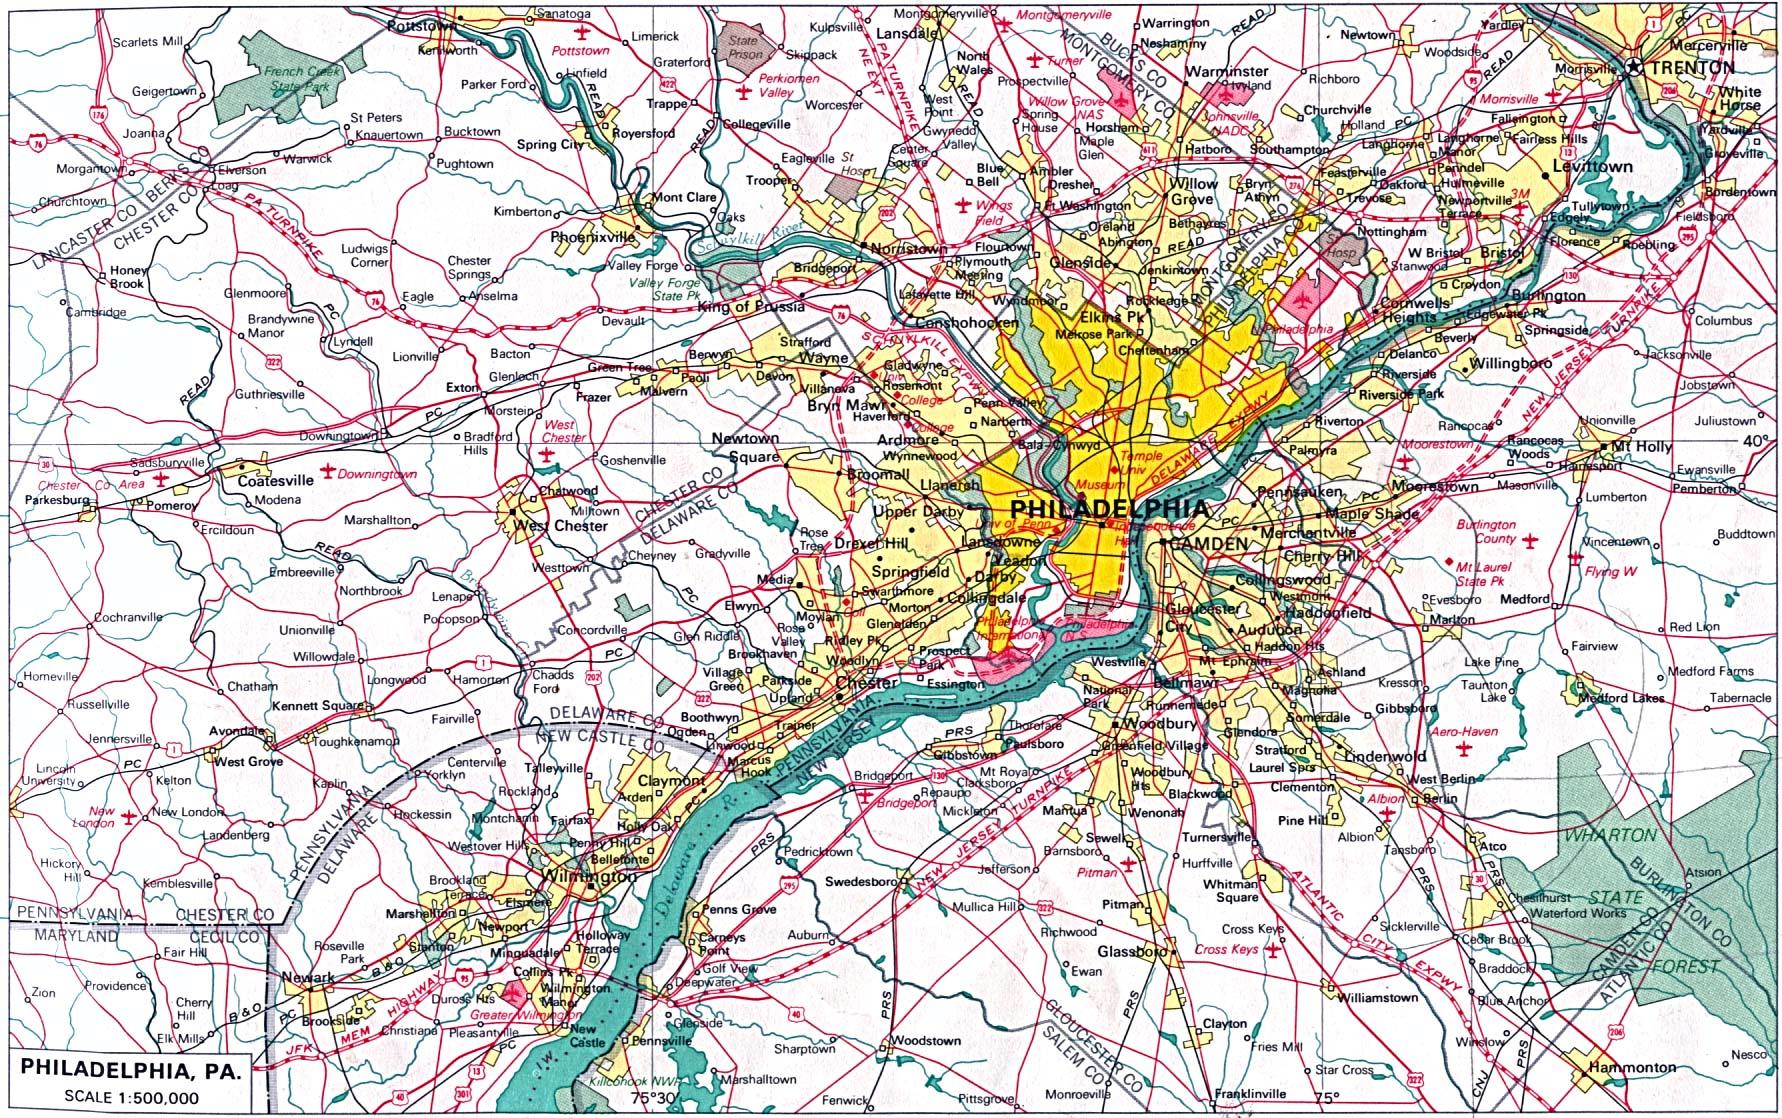 Philadelphia City Map, Pennsylvania, United States